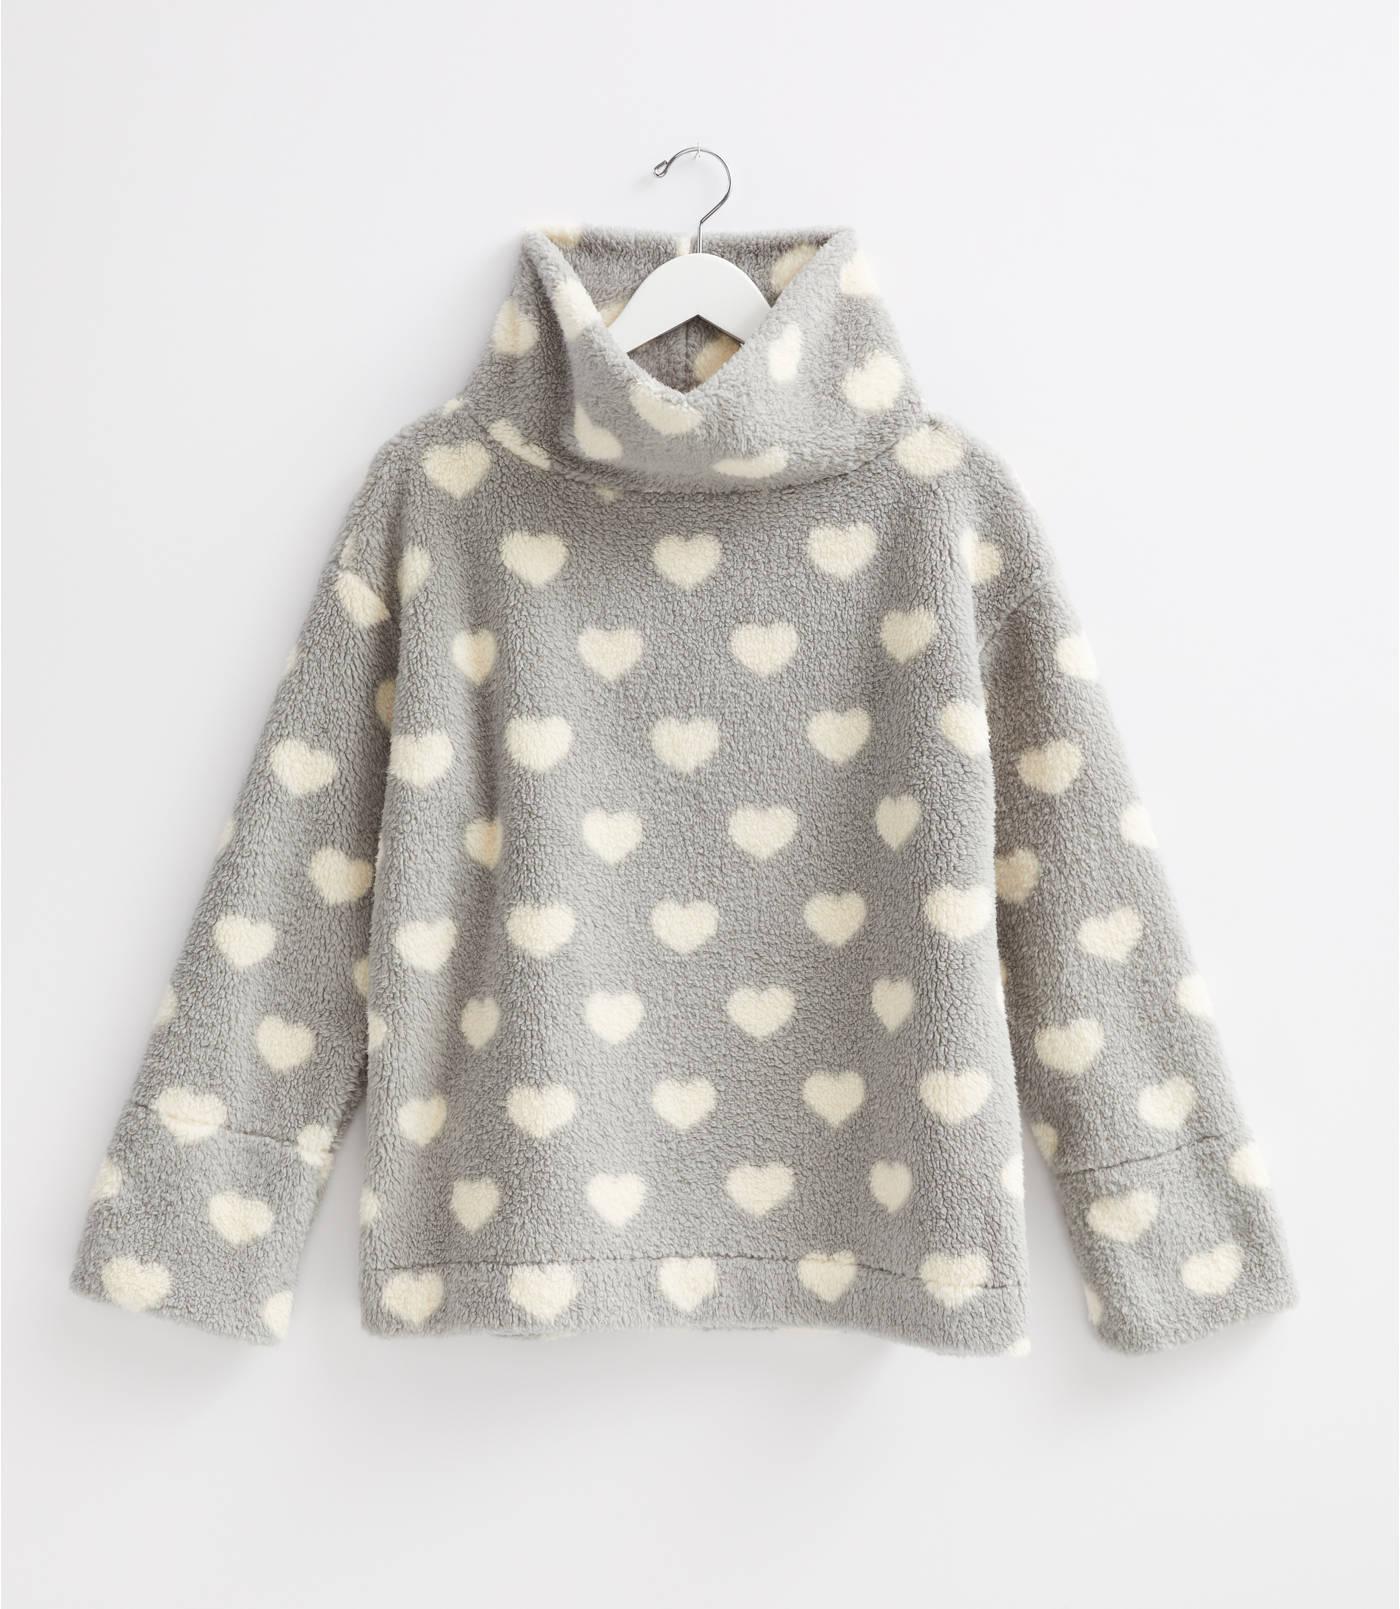 Lou & Grey Heart Cozy Up Cowl Top